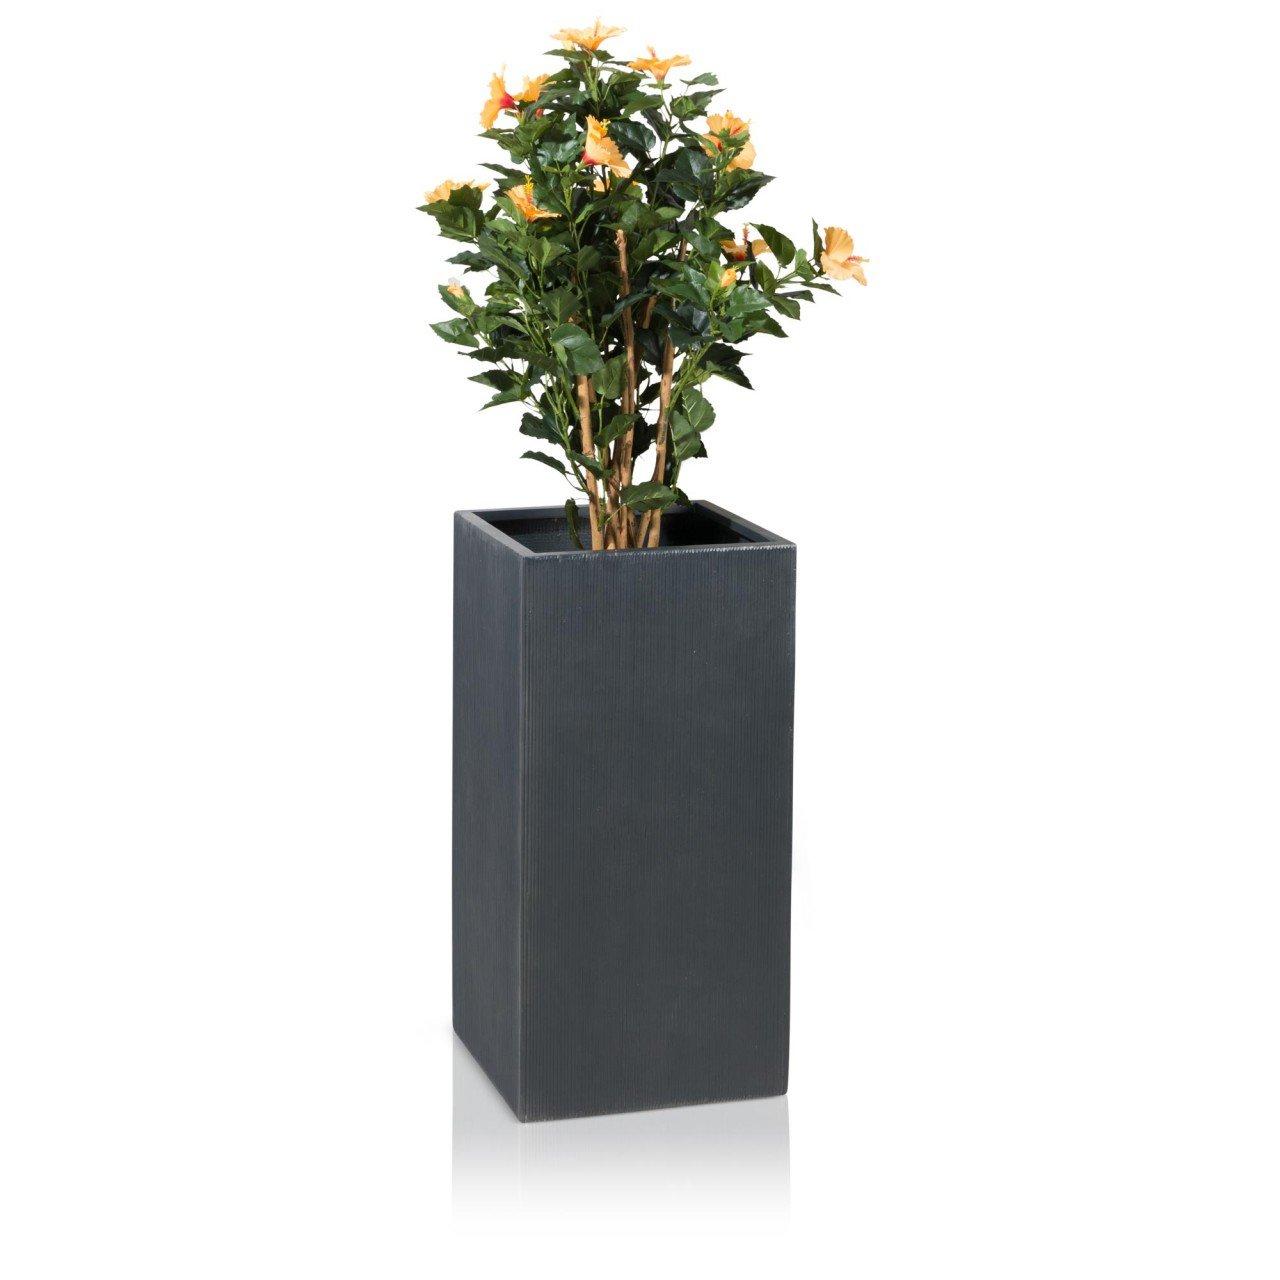 pflanzk bel blumenk bel torre 80 fiberglas 40x40x80 cm anthrazit geriffelt g nstig bestellen. Black Bedroom Furniture Sets. Home Design Ideas